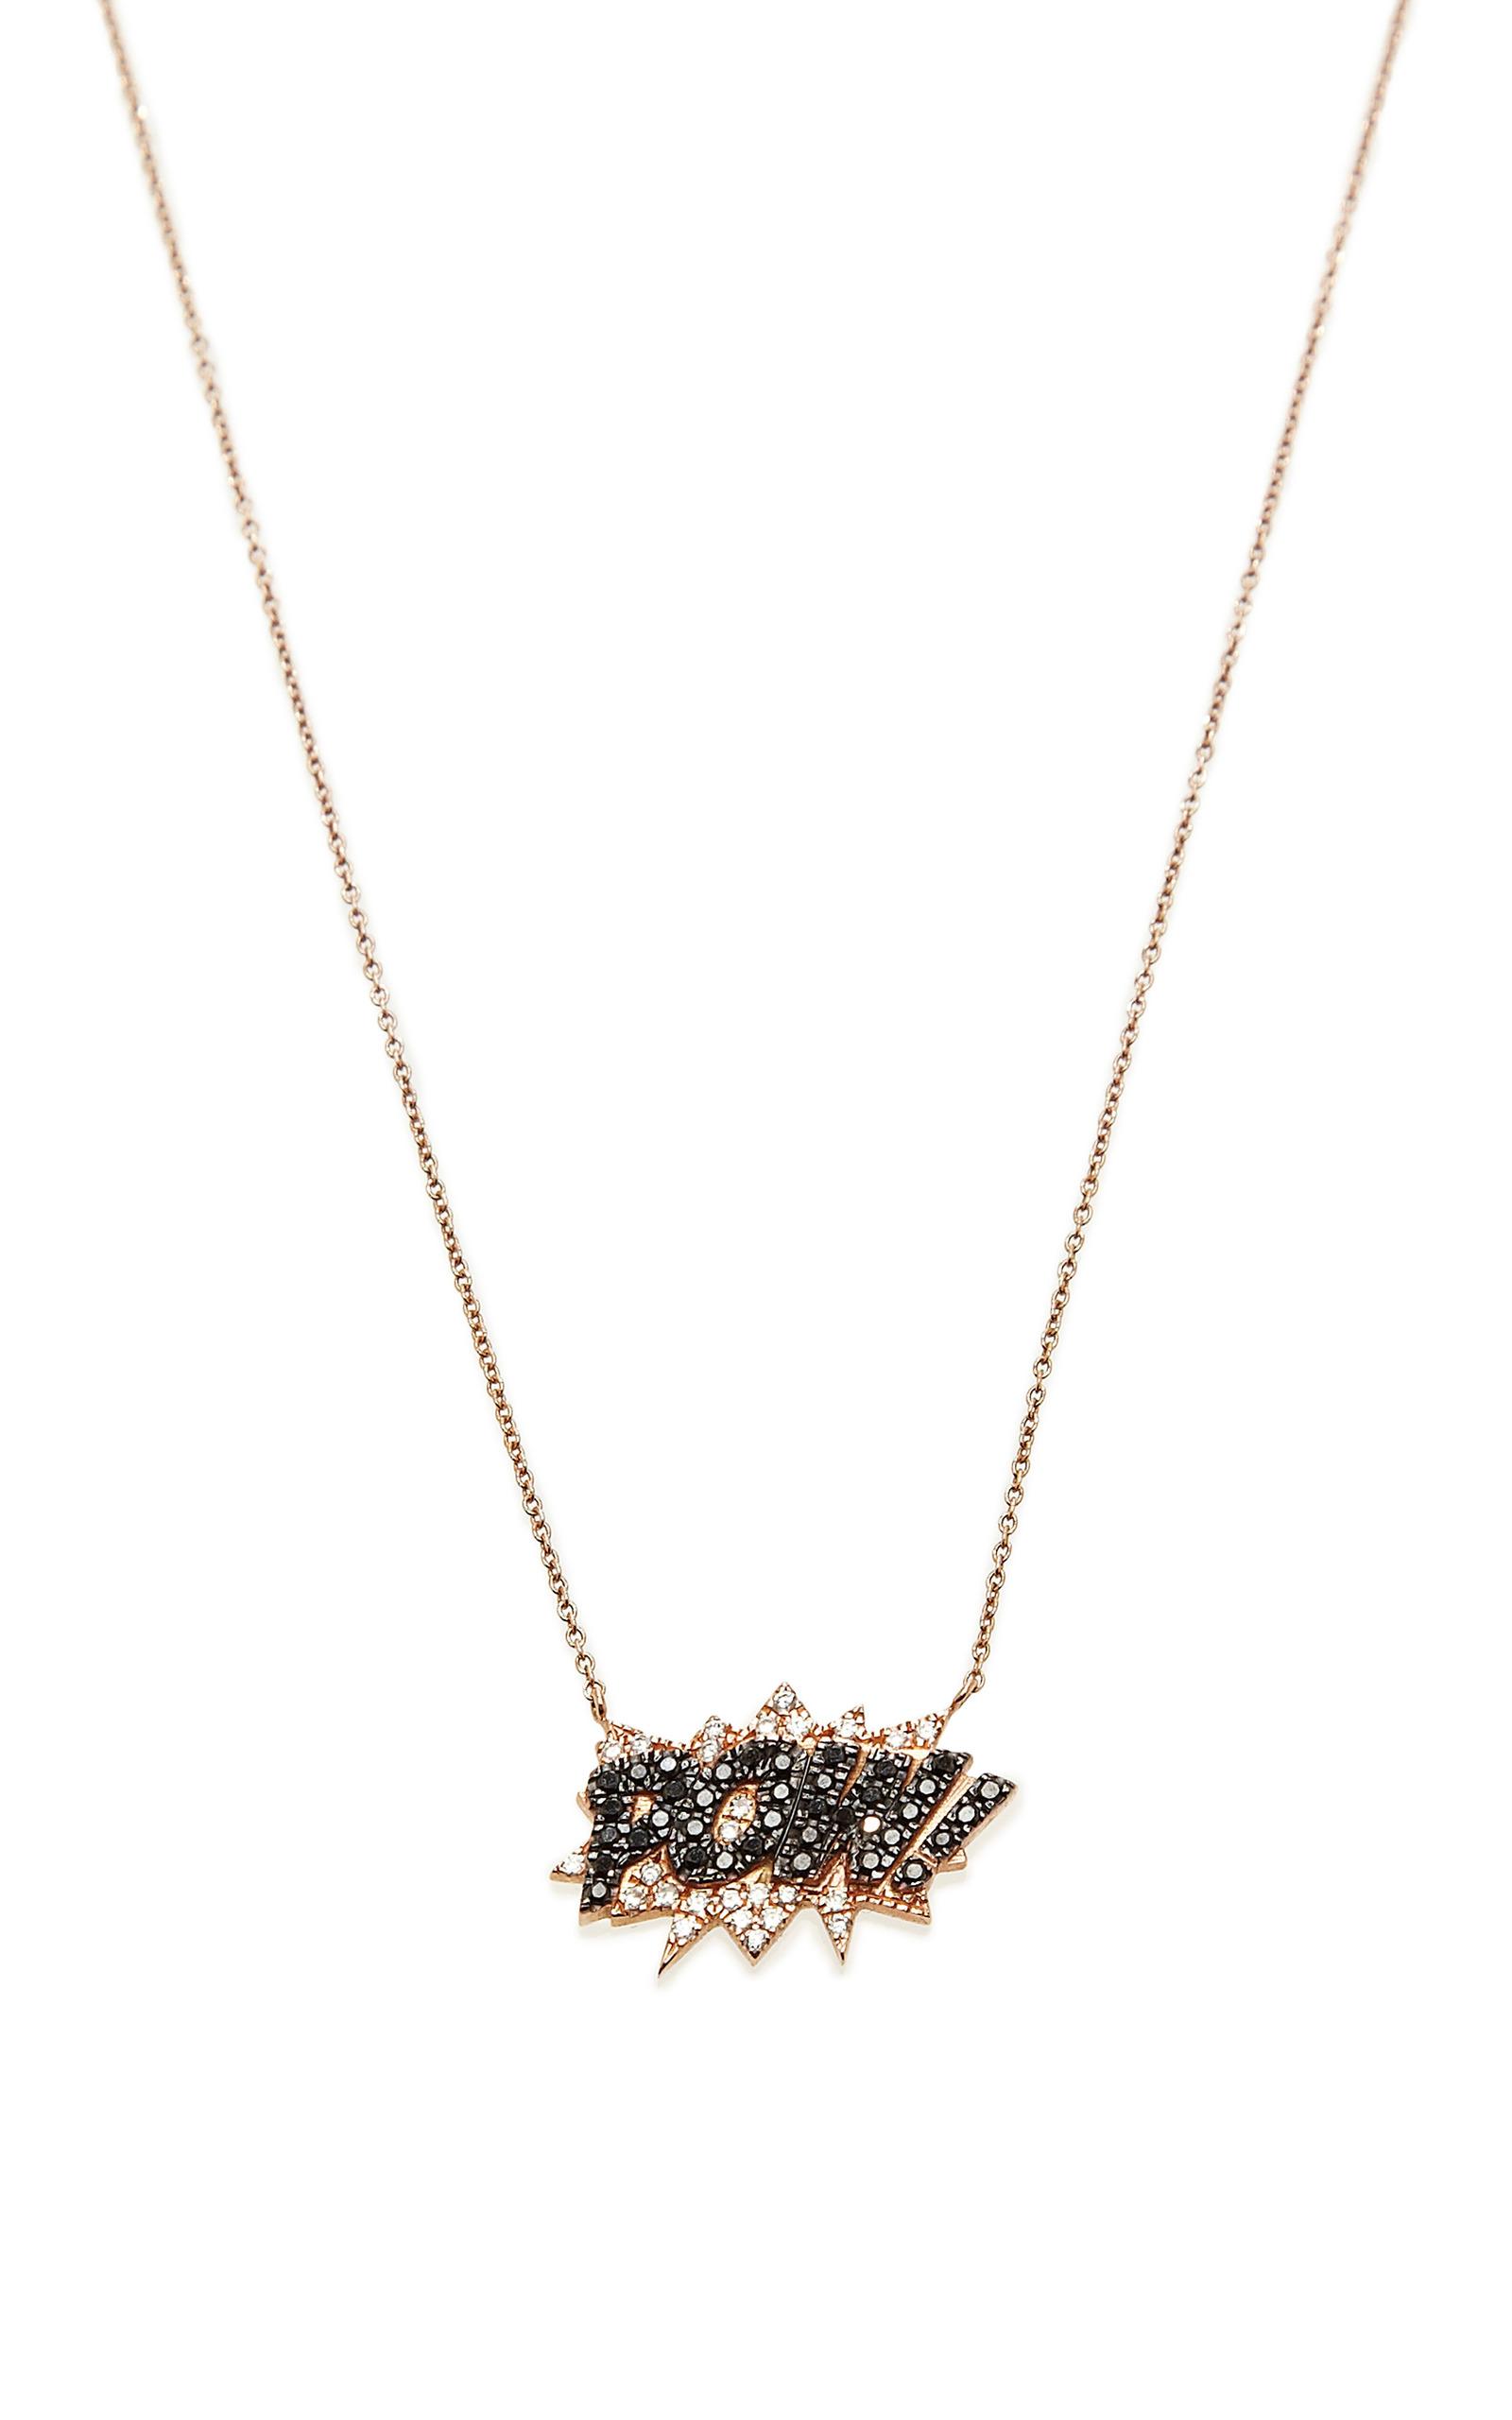 Diamant, Turquoise Et Or 18 Kt Collier Diane Kordas